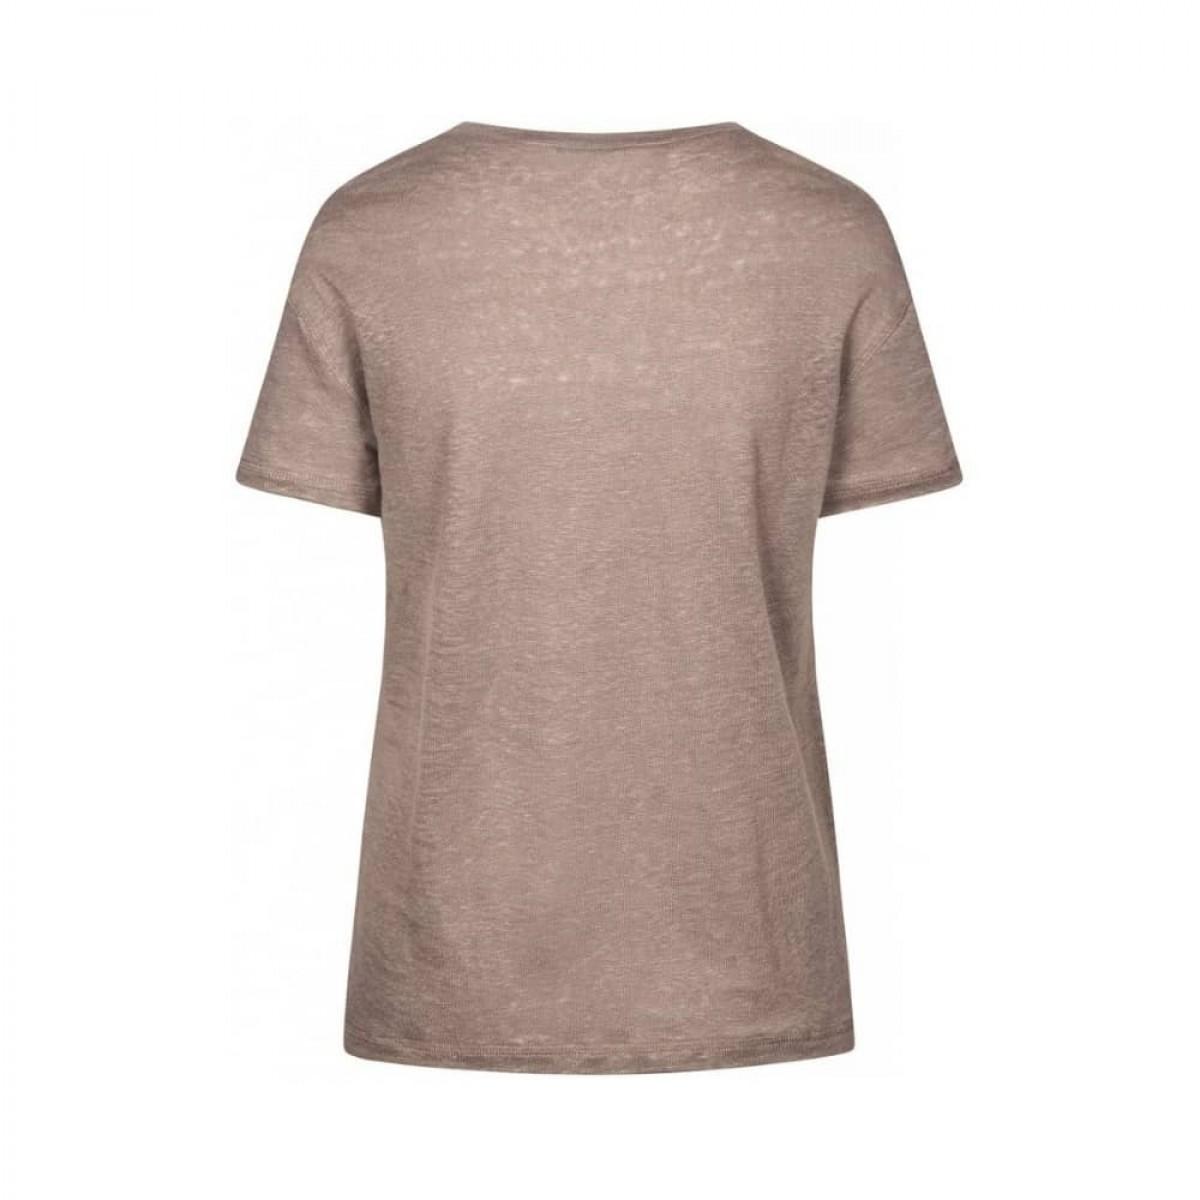 sif v-hals t-shirt - hazy brown - ryggen